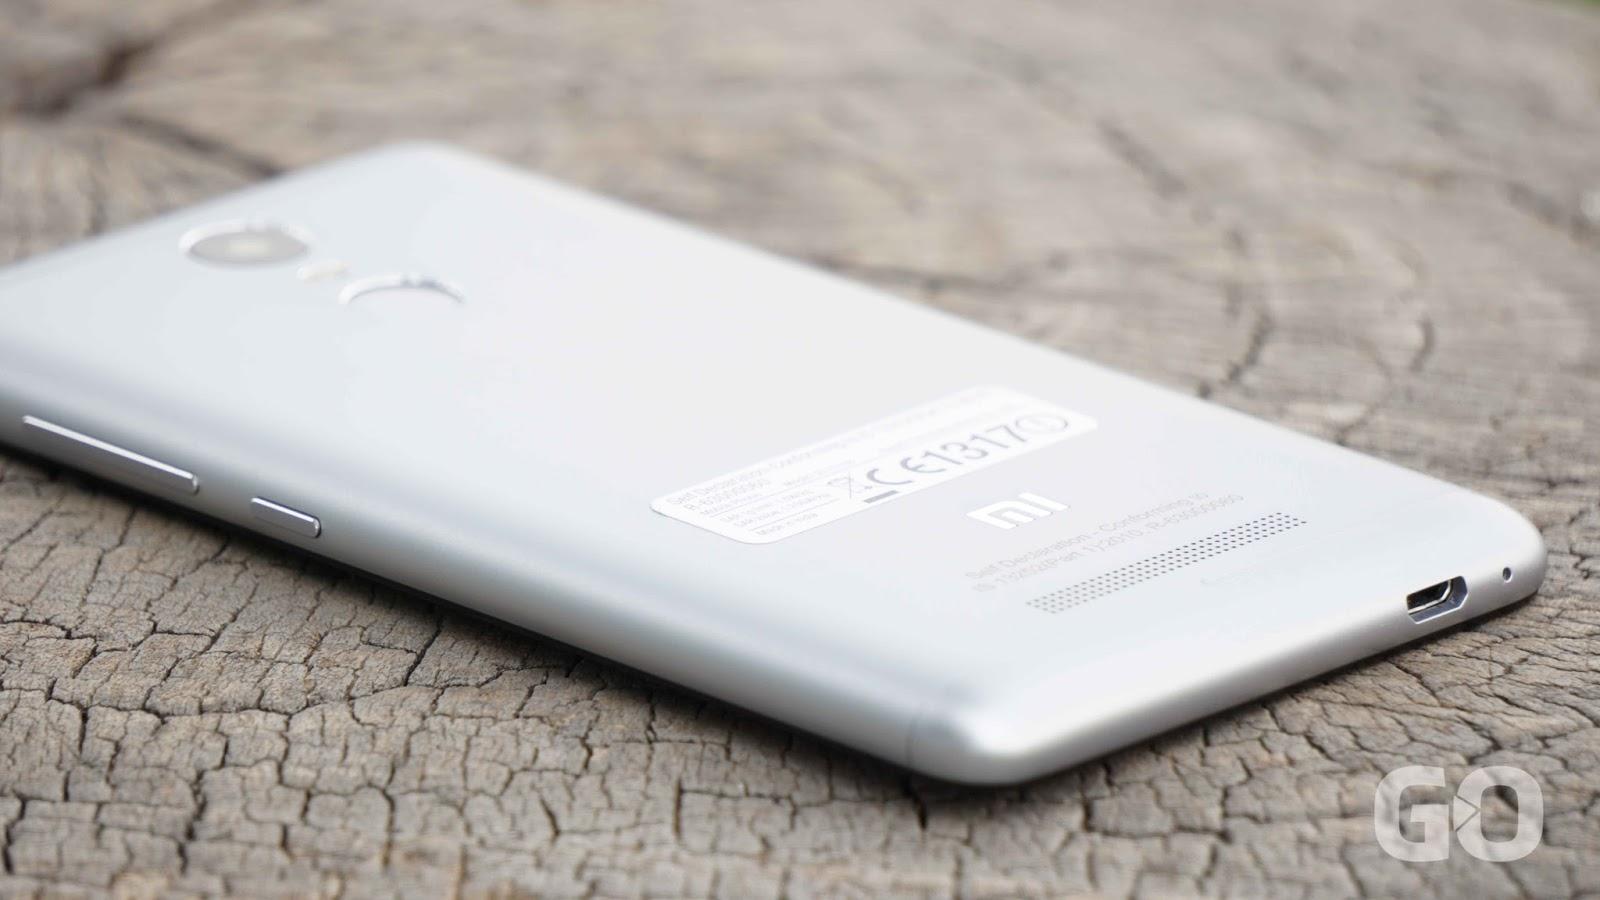 Hd wallpaper redmi note 4 - Rumor Xiaomi Redmi Note 4 Might Be Arriving Soon